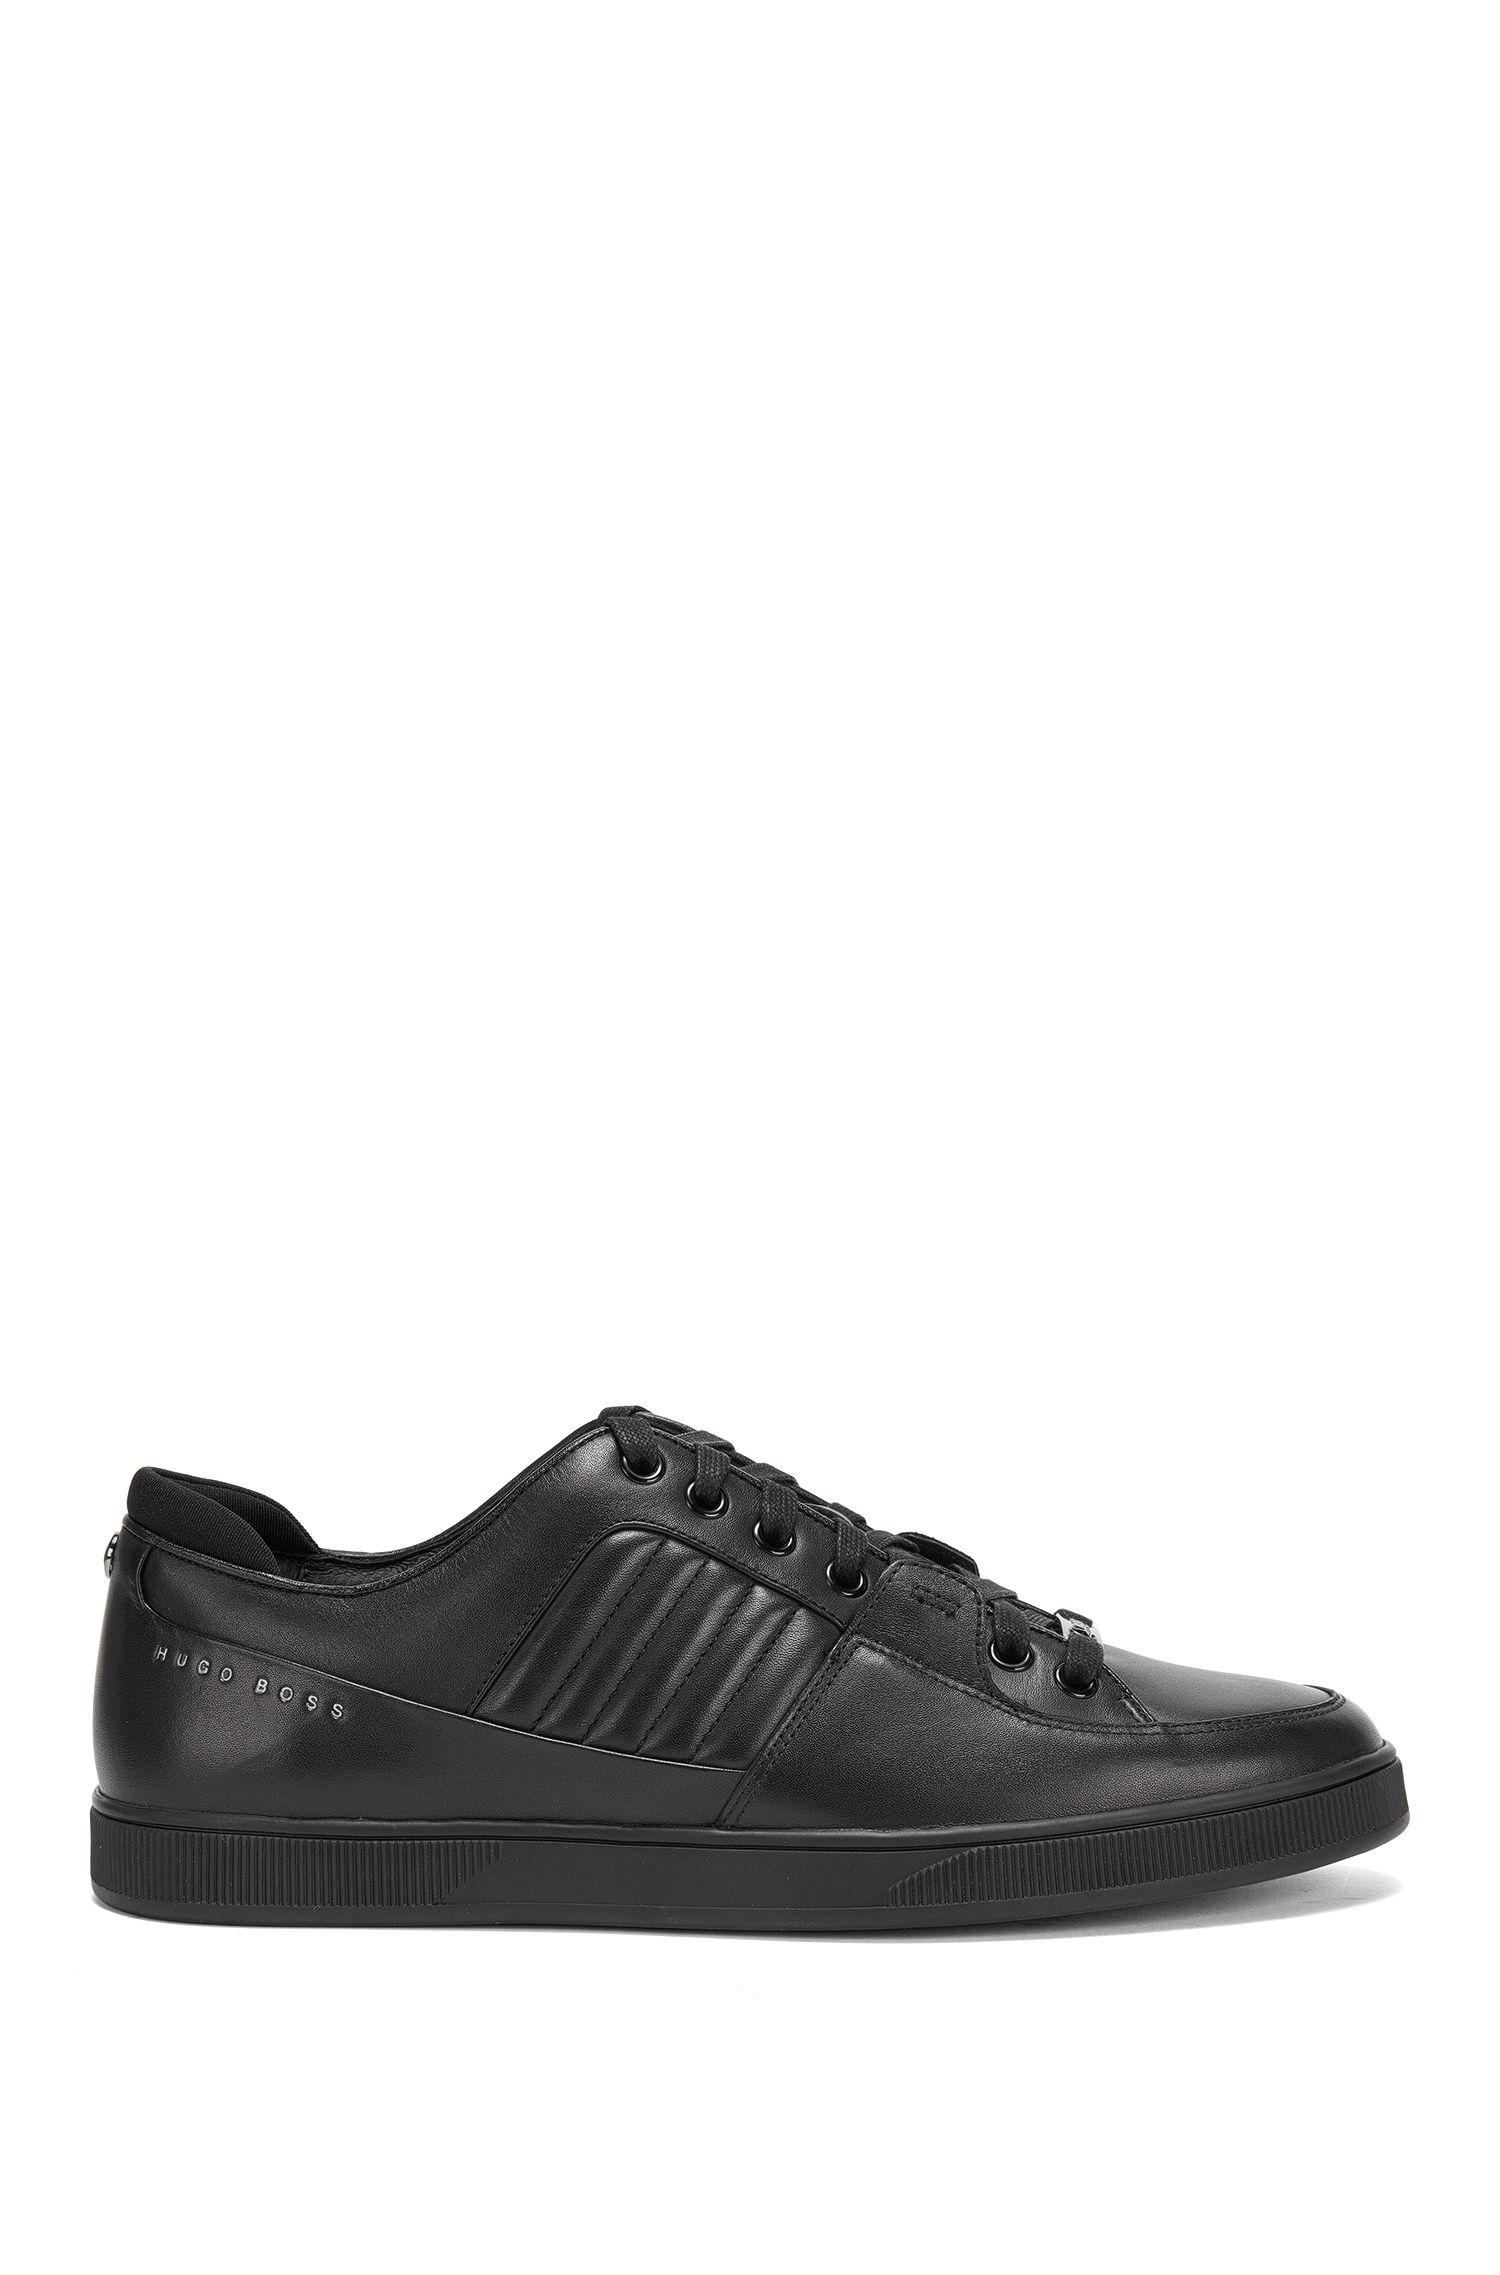 'Across Tenn Mxmb' | Mercedes-Benz Leather Sneakers